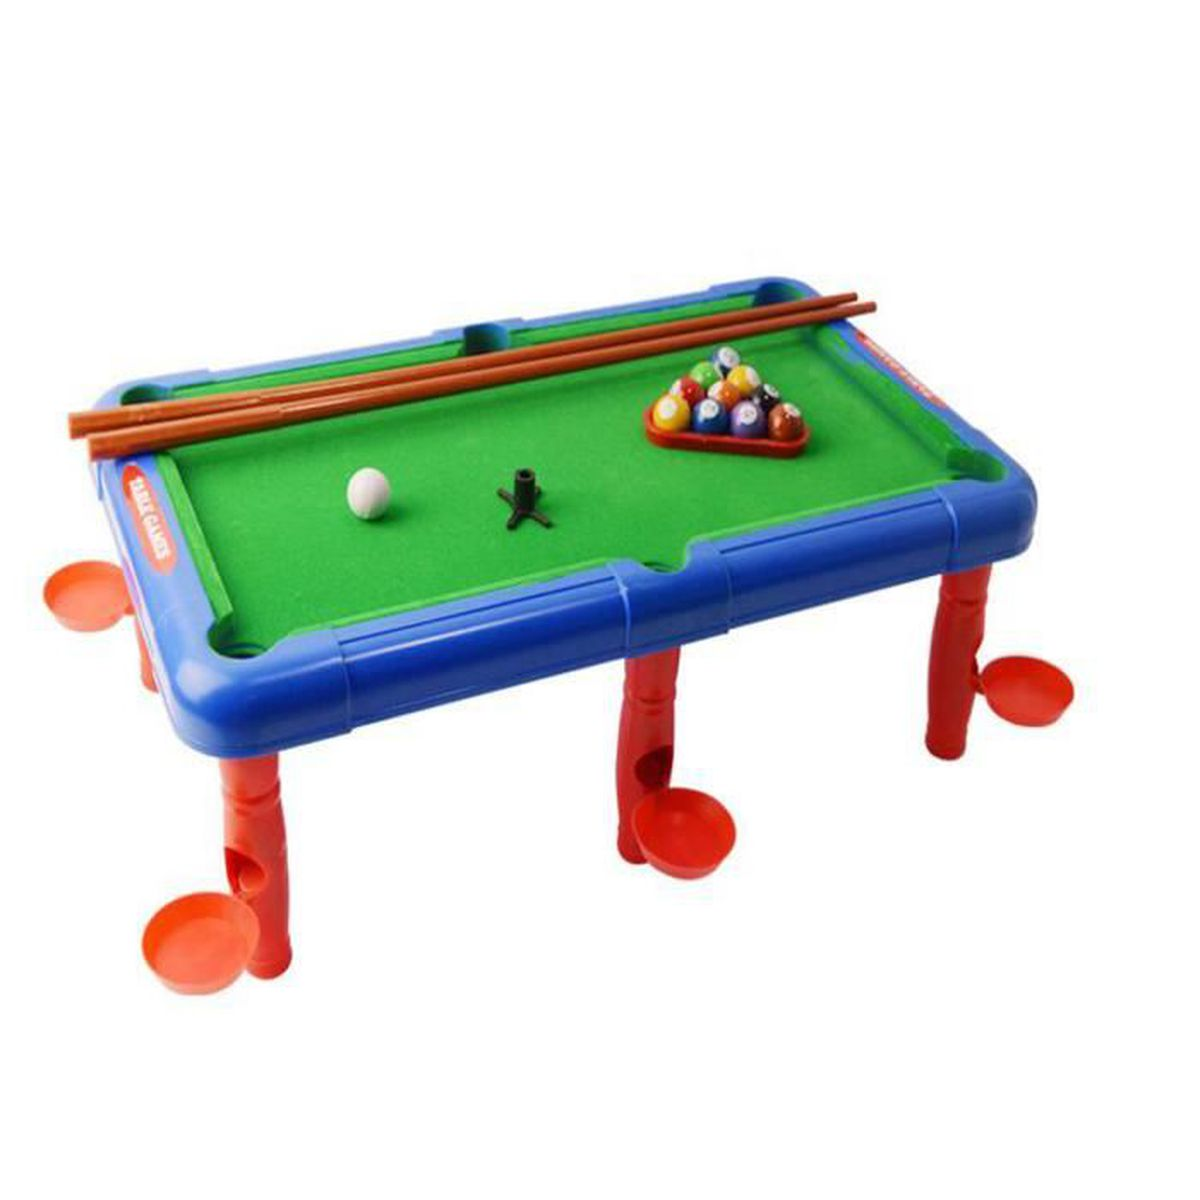 stoex 6 en 1 table de billard jeu billes de snooker et. Black Bedroom Furniture Sets. Home Design Ideas